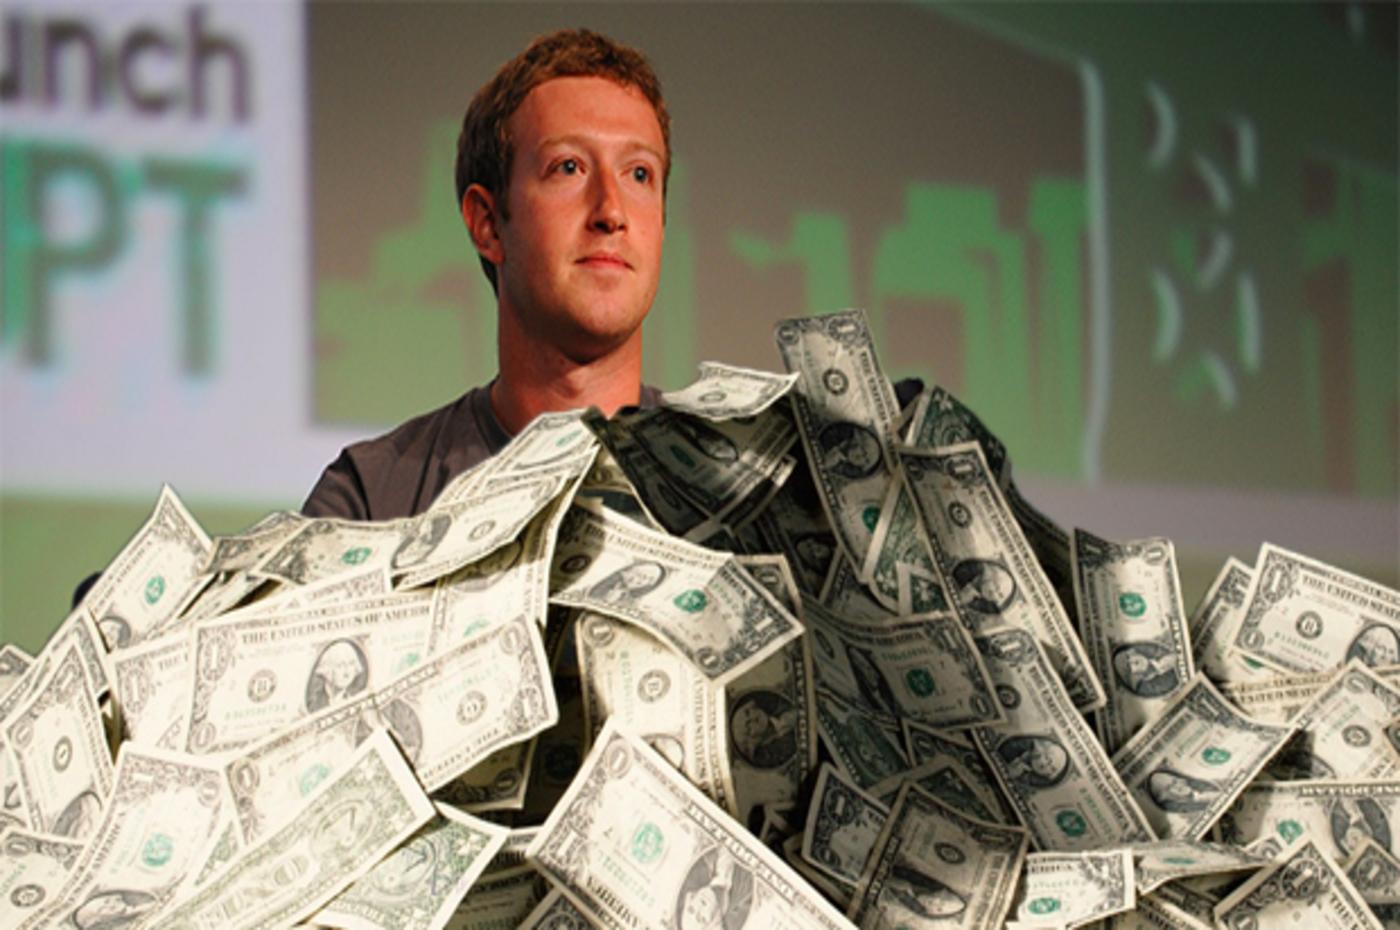 Mark Zuckerberg a gagné plus de 6 milliards de dollars hier